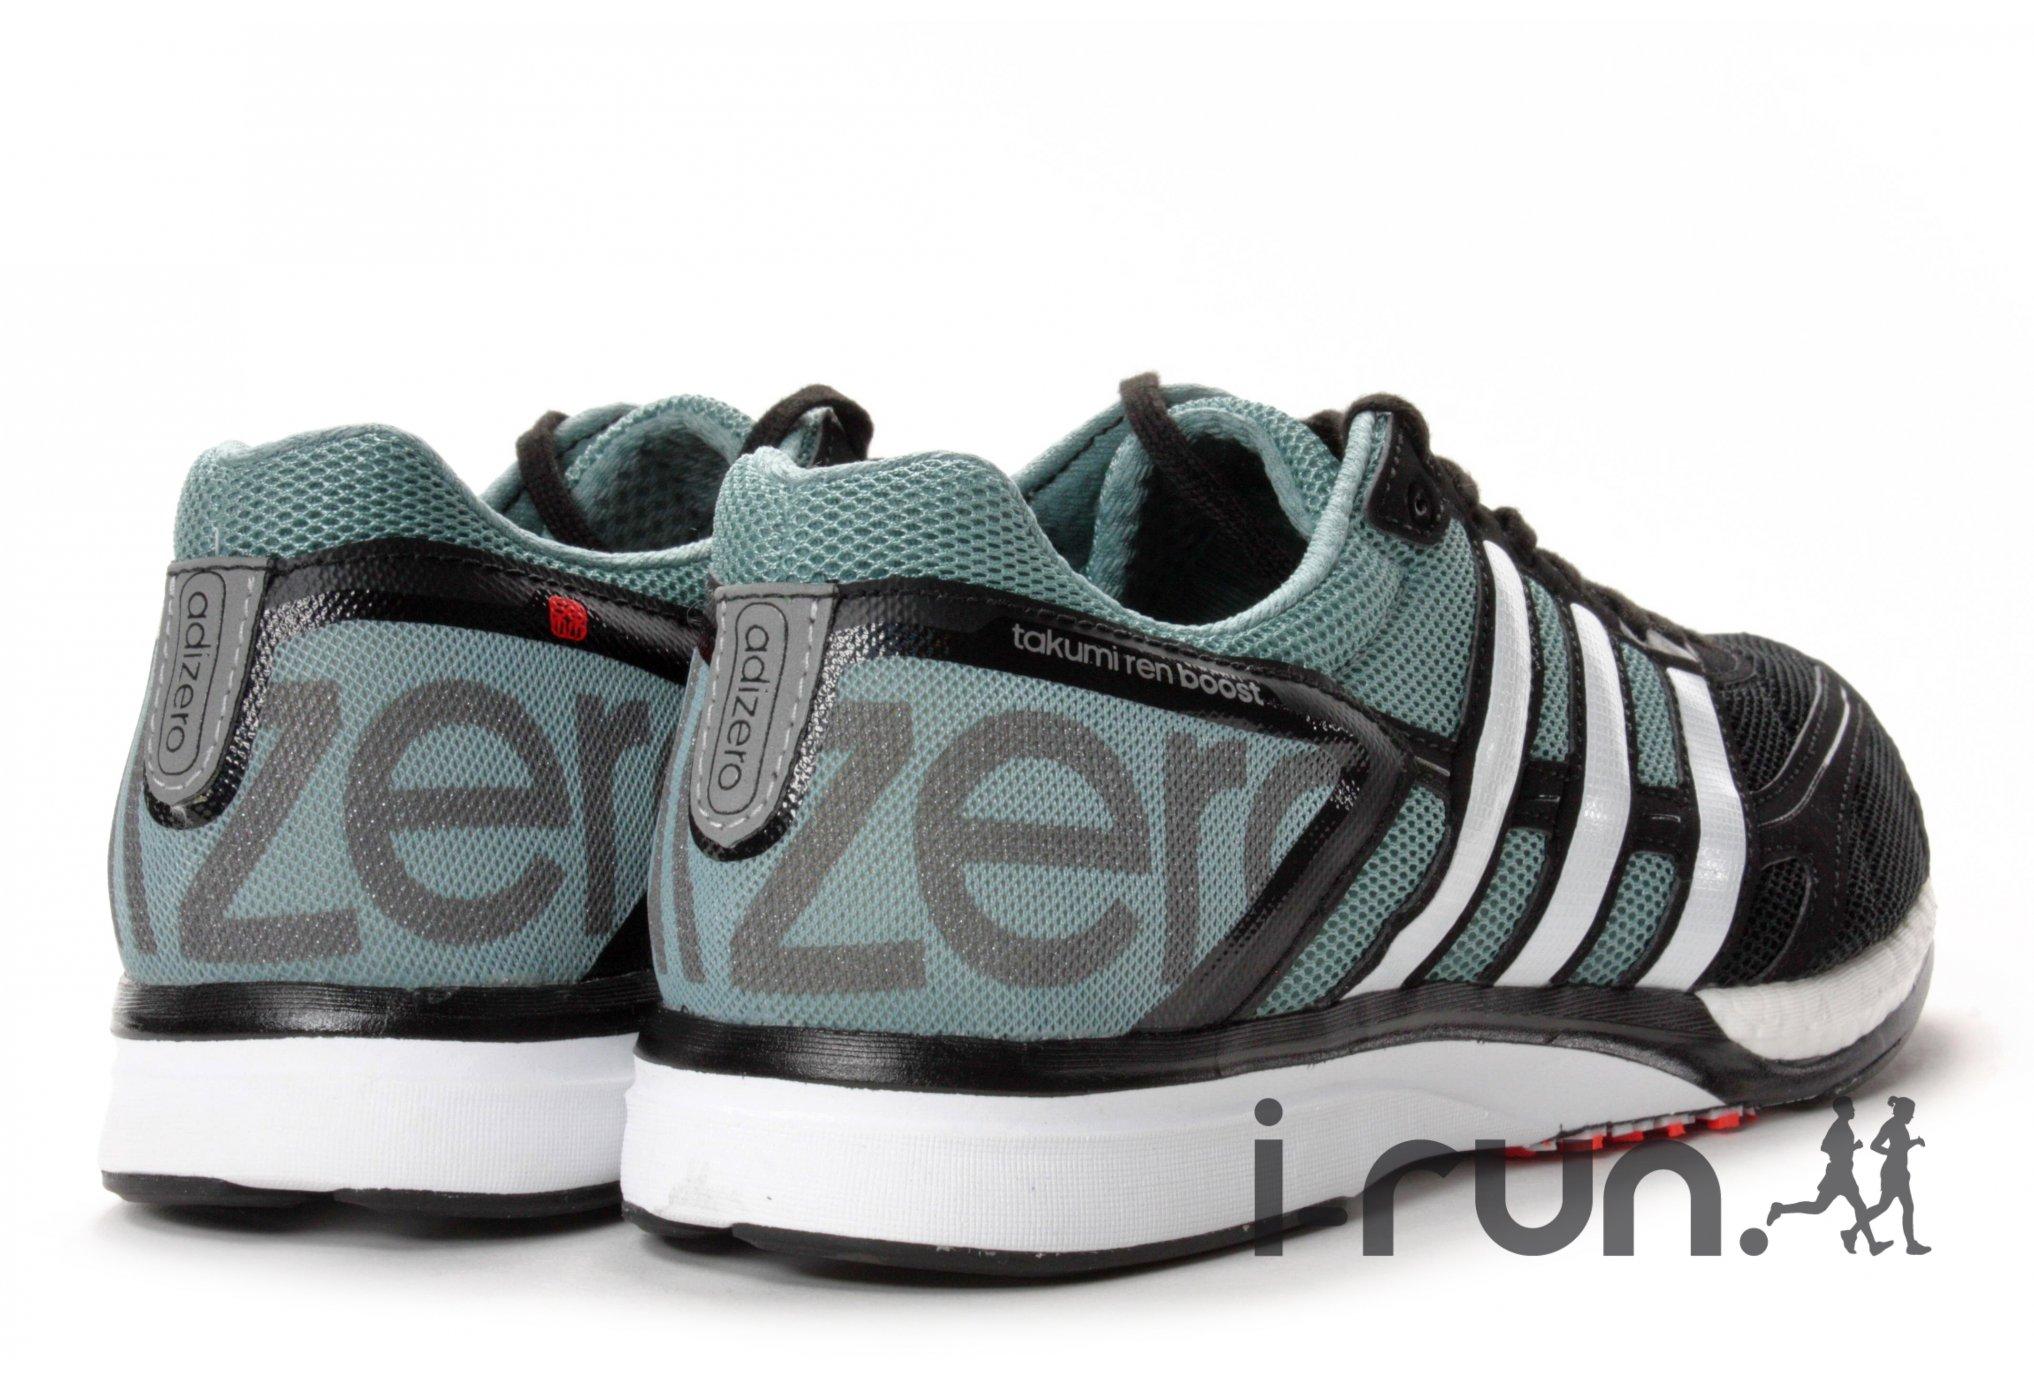 hot sale online 8856a 6fa42 adidas adizero takumi ren boost 3 m